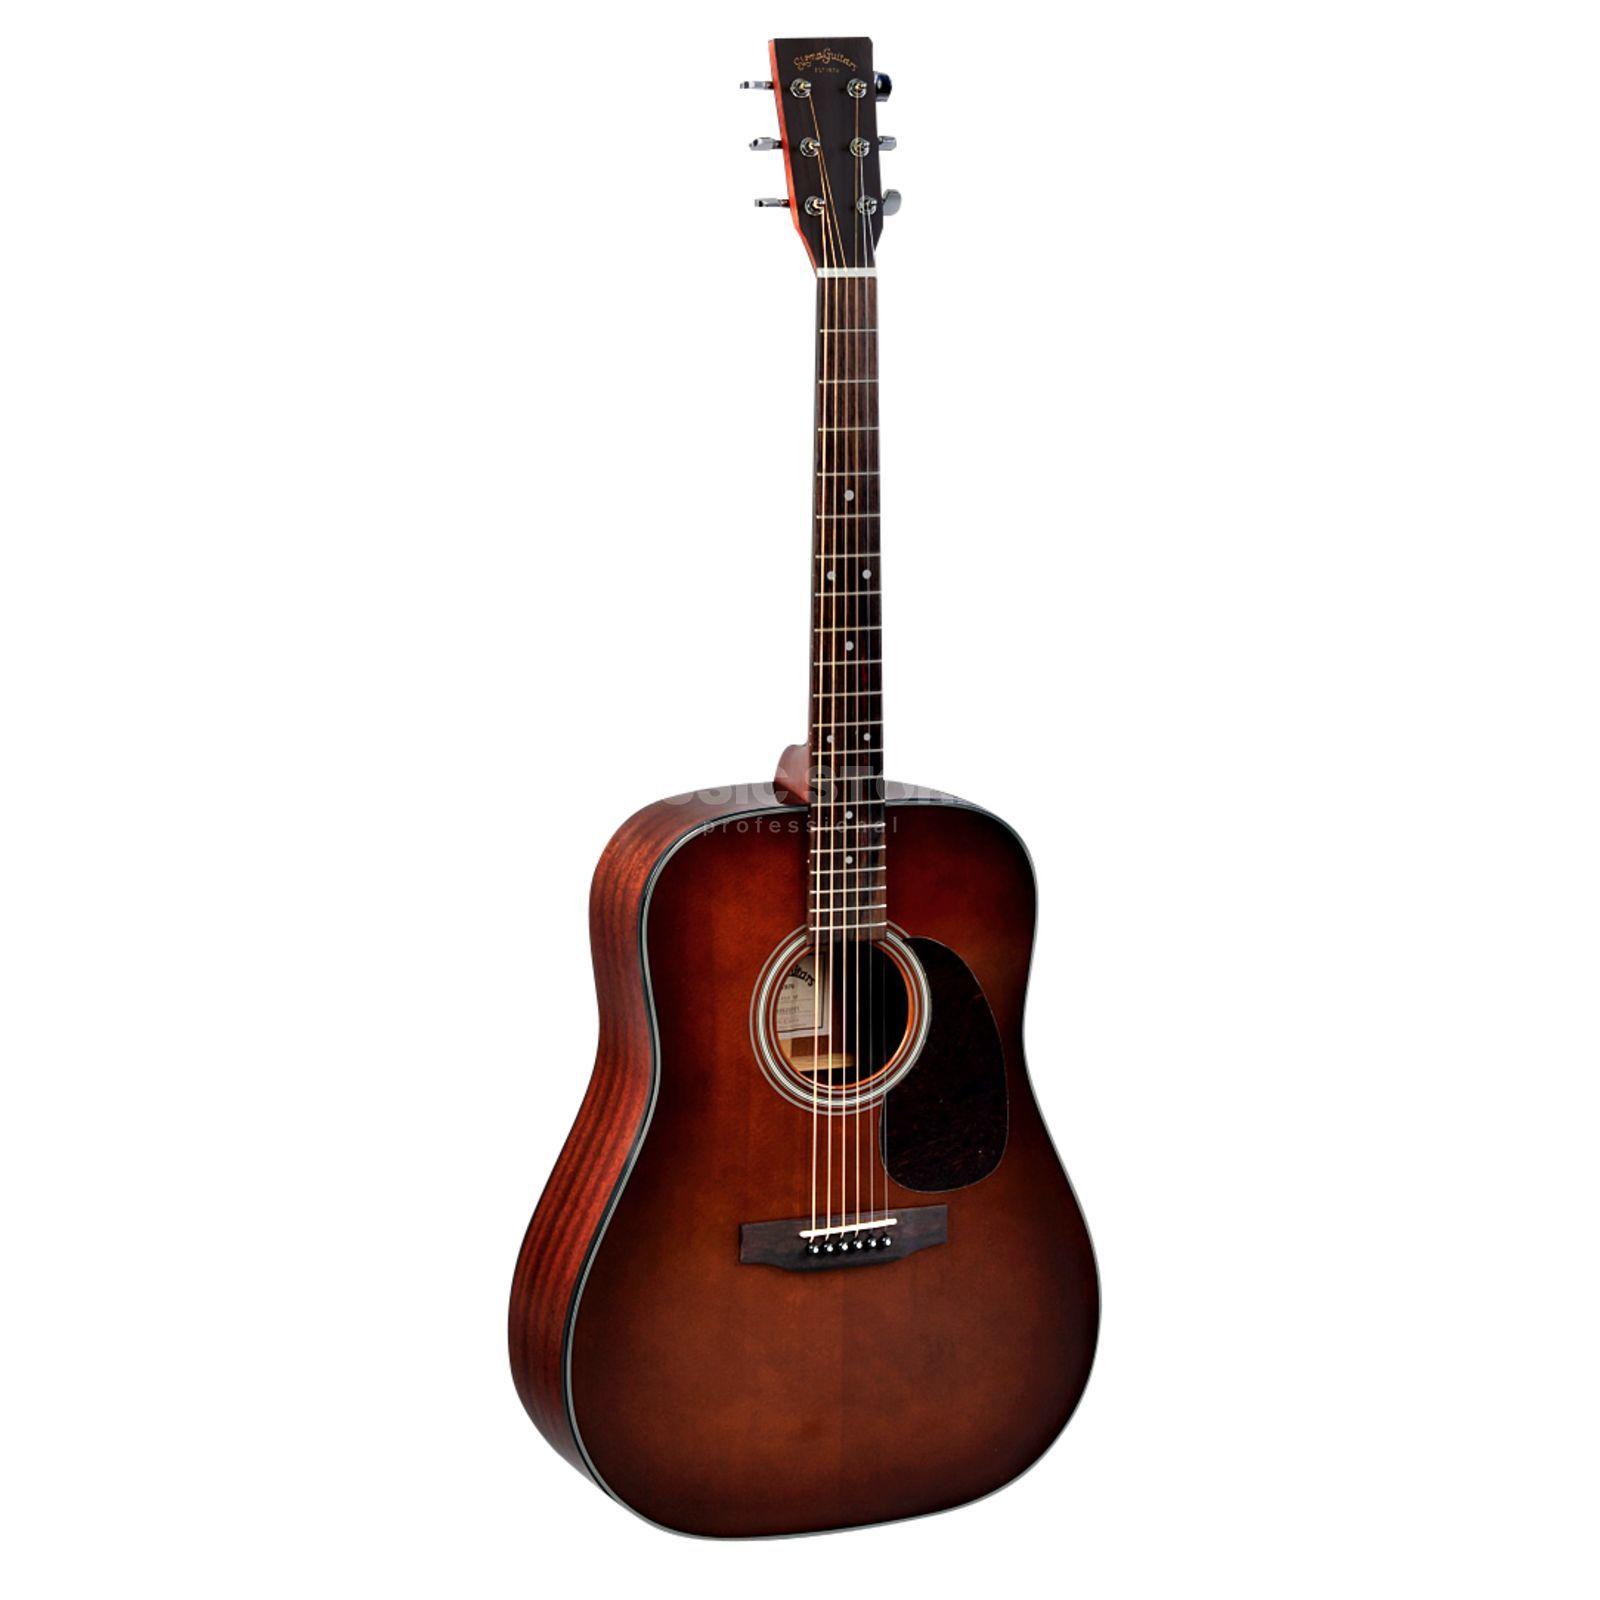 sigma guitars dm1stbr brownburst